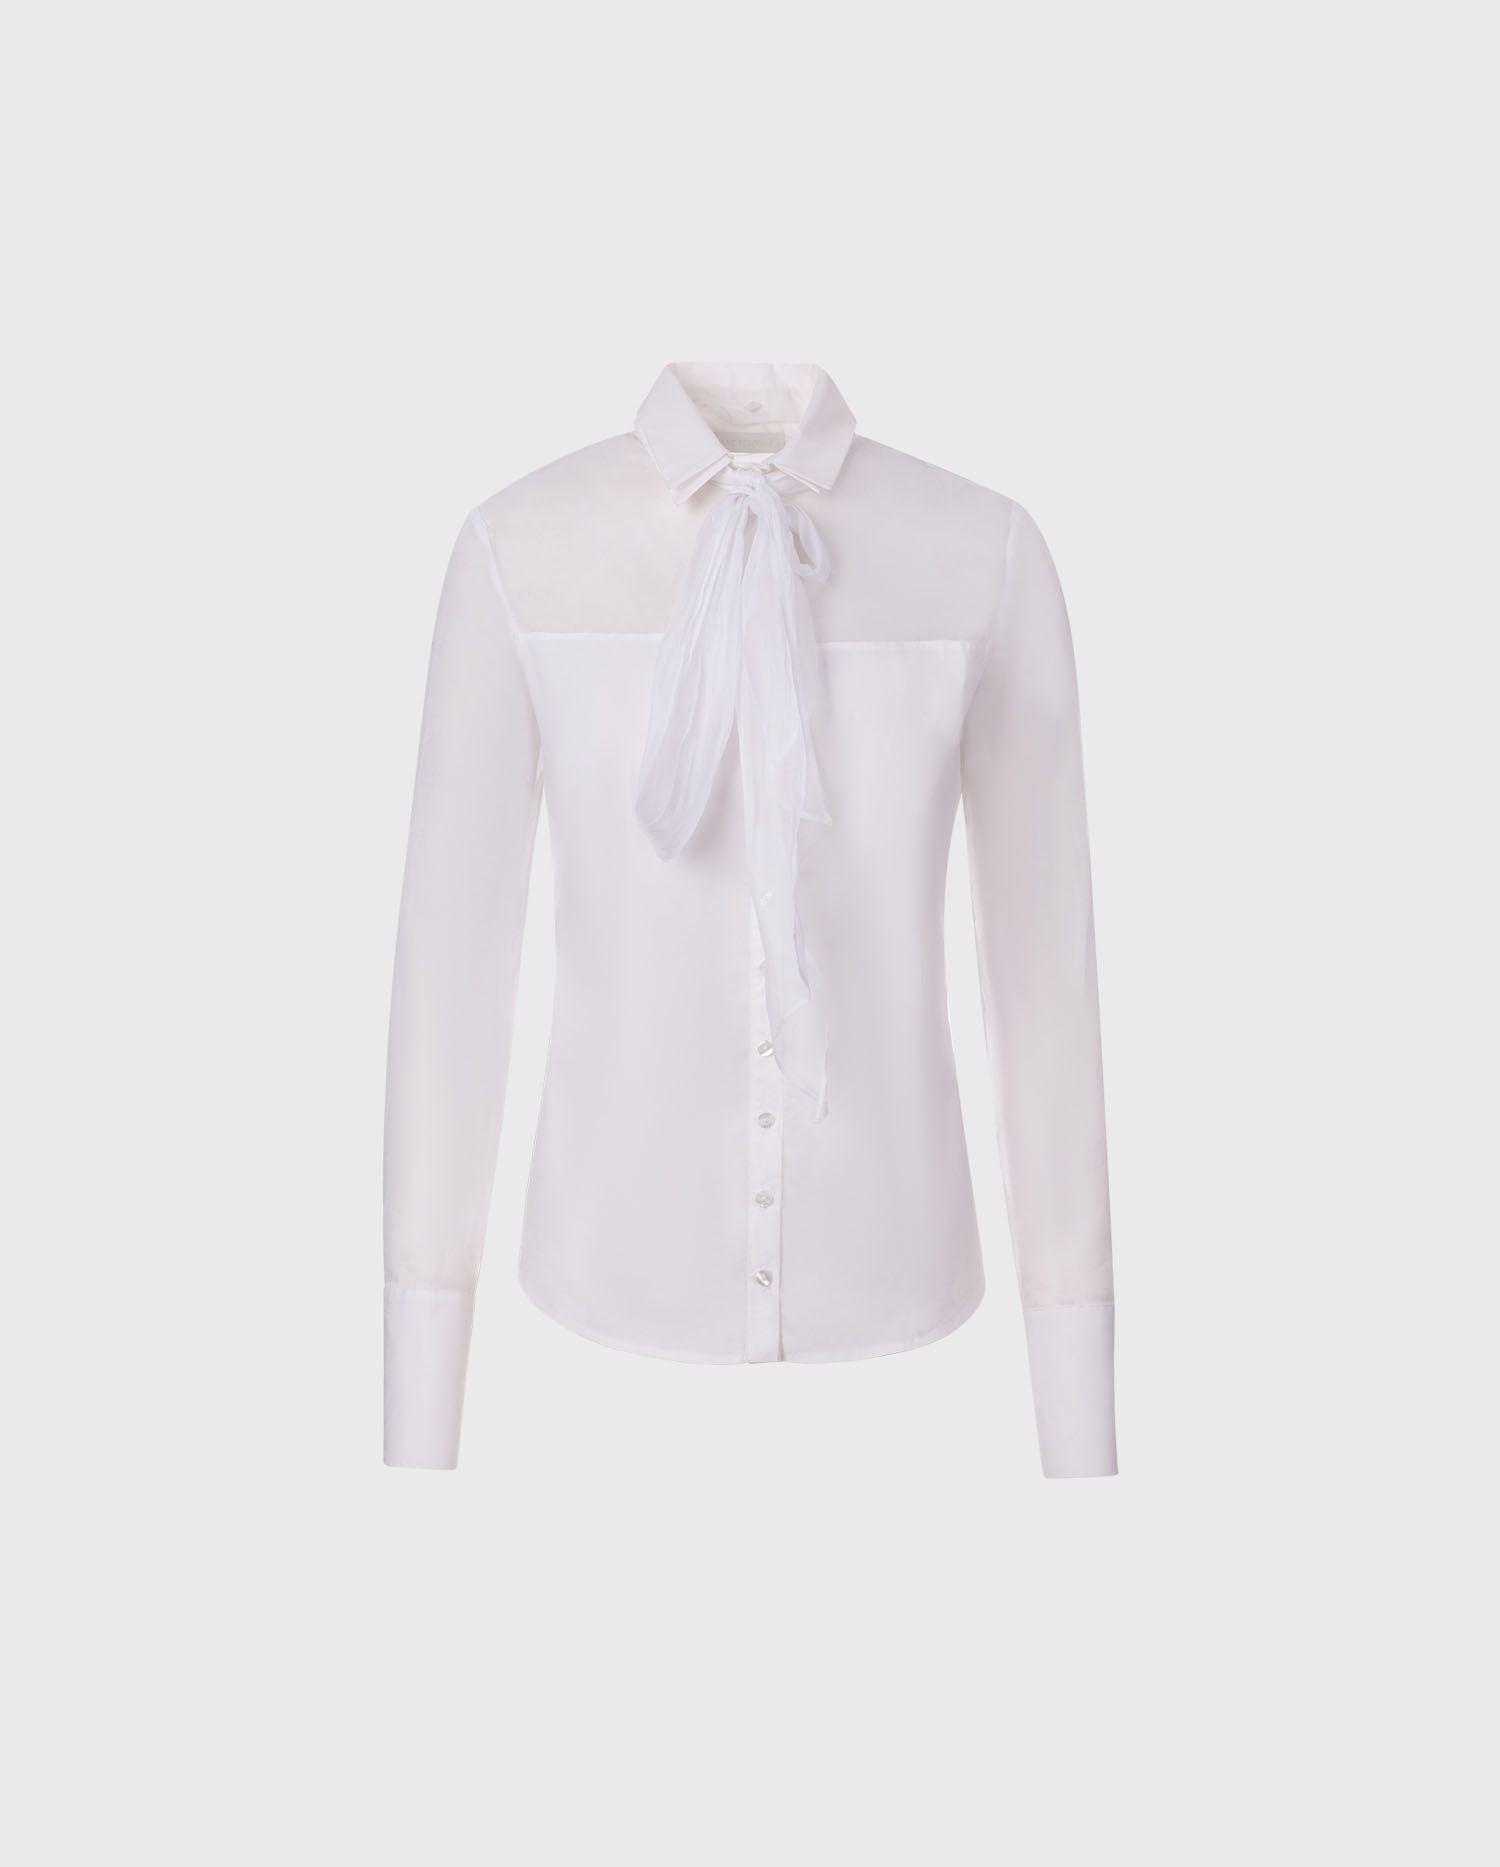 Anne Fontaine Laurentine Shirt: Poplin shirt with sheer organdy yoke and sleeves